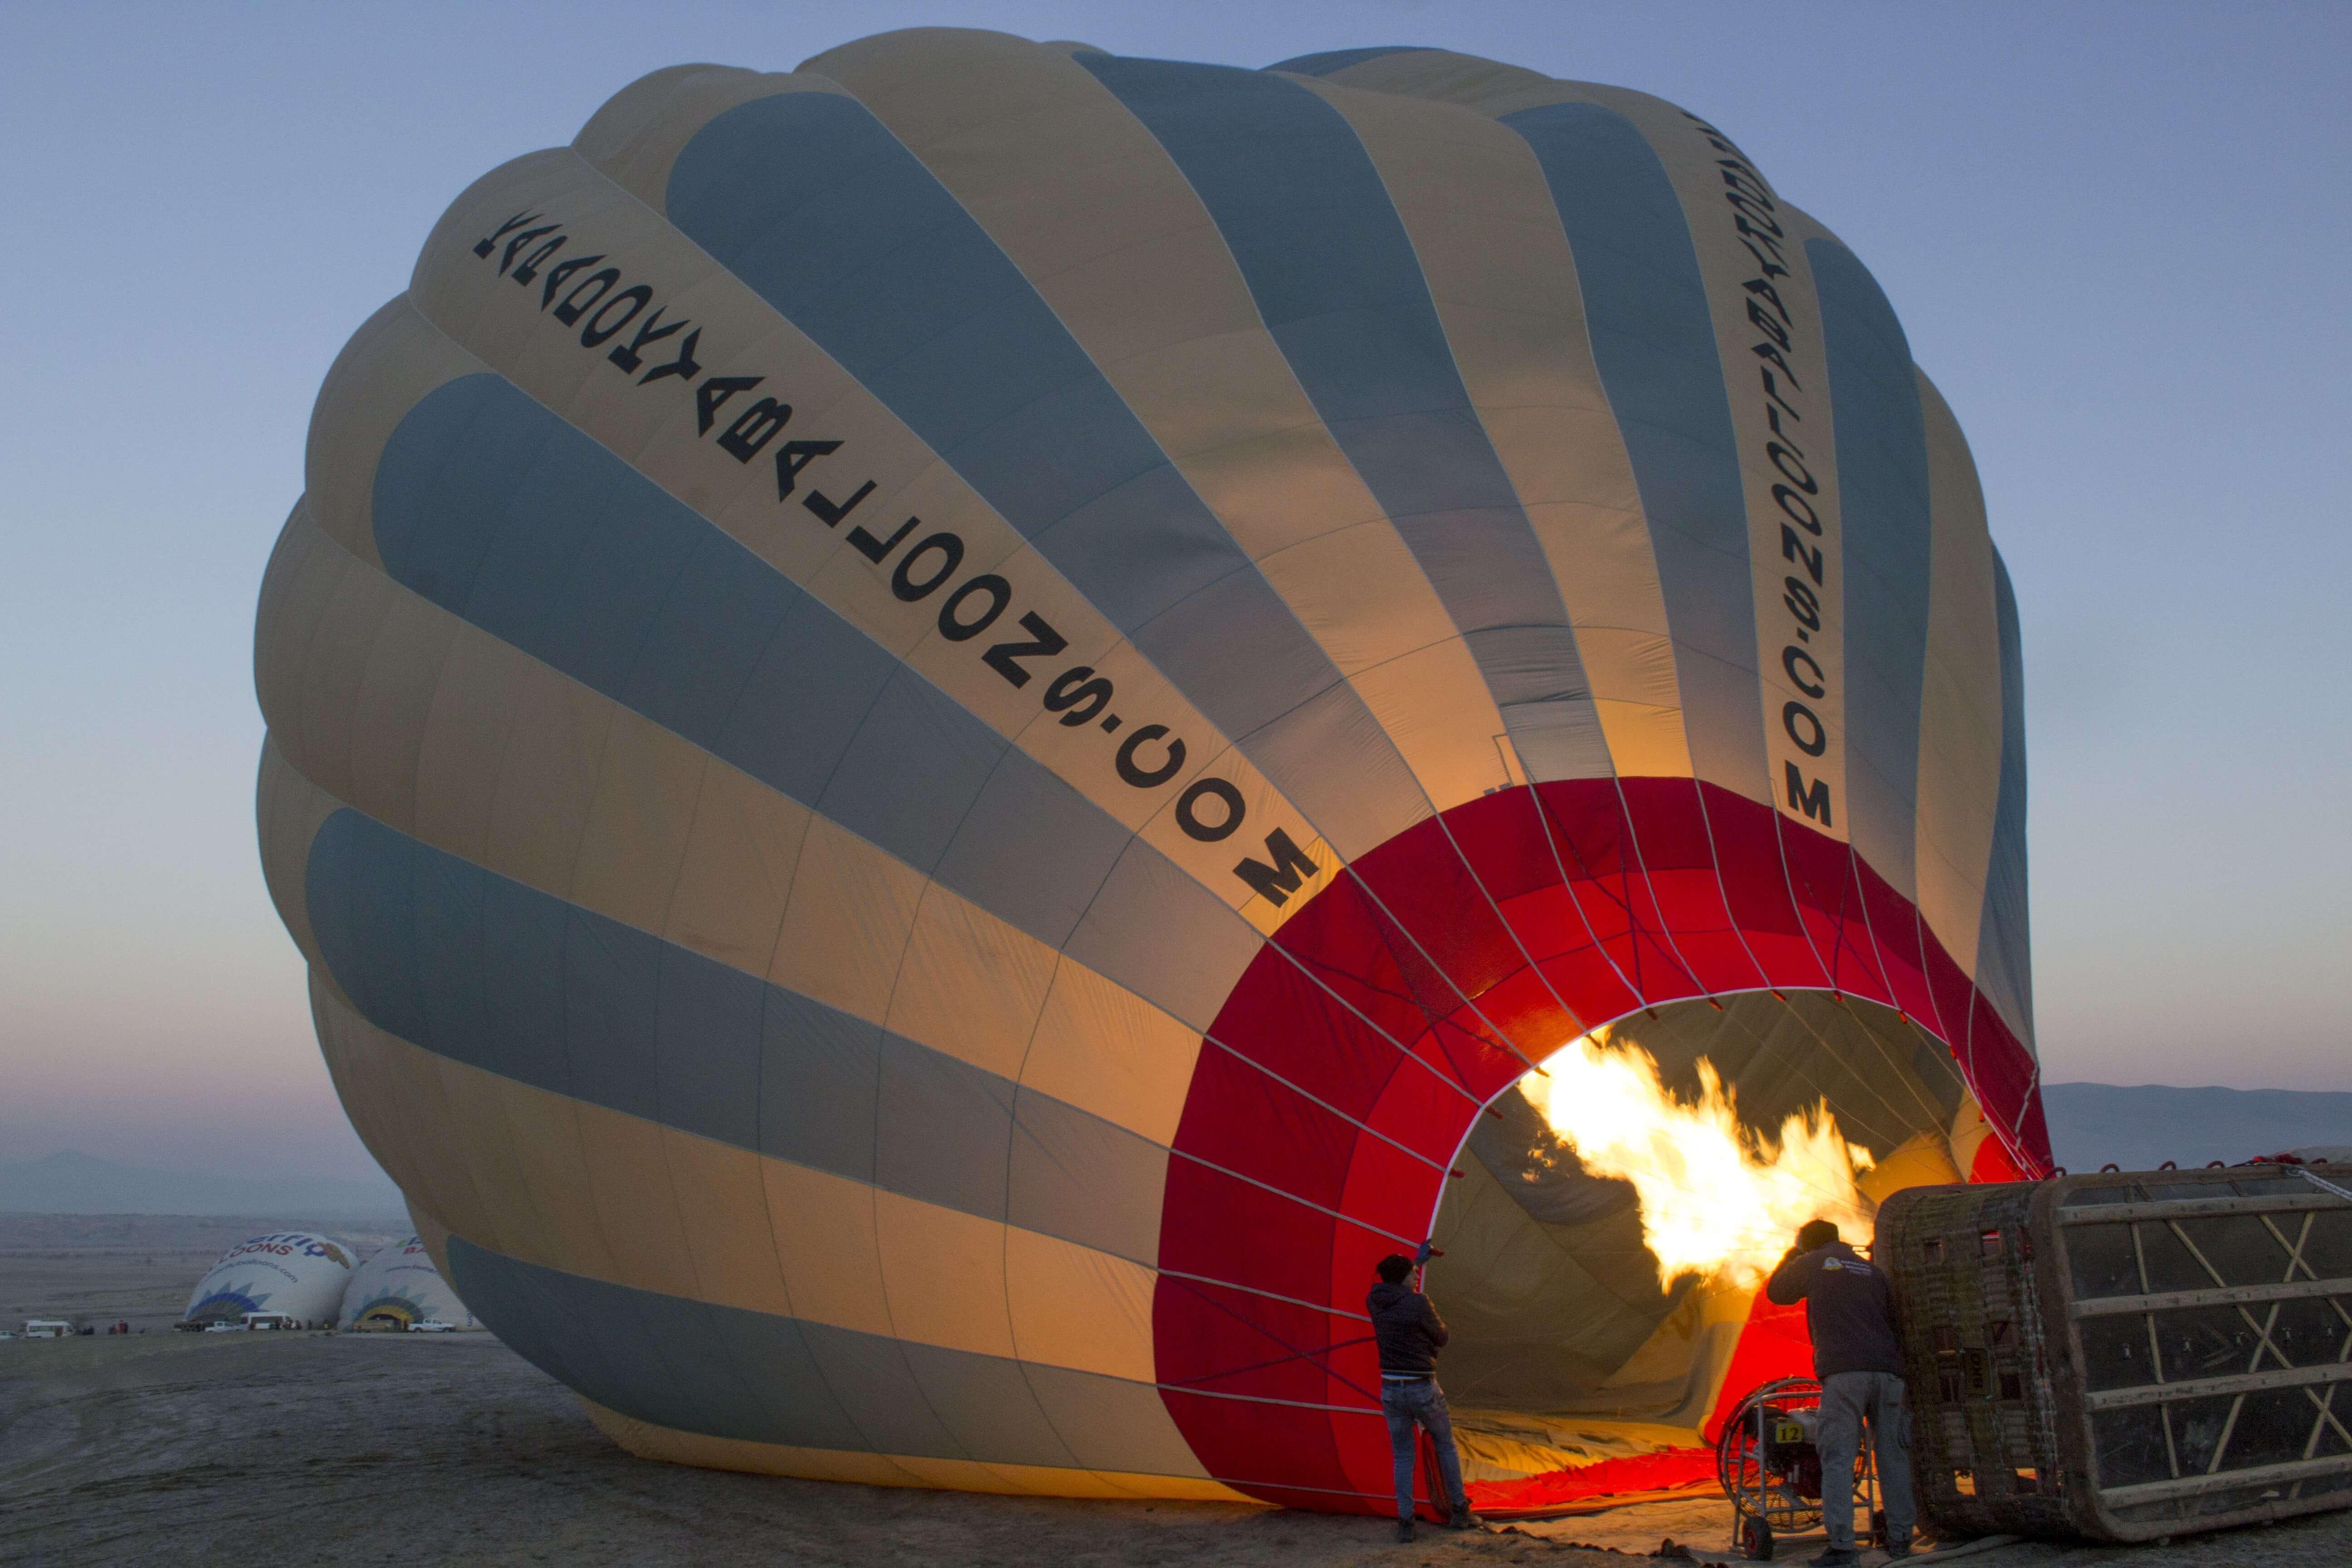 blowing up a hot air balloon at sunrise